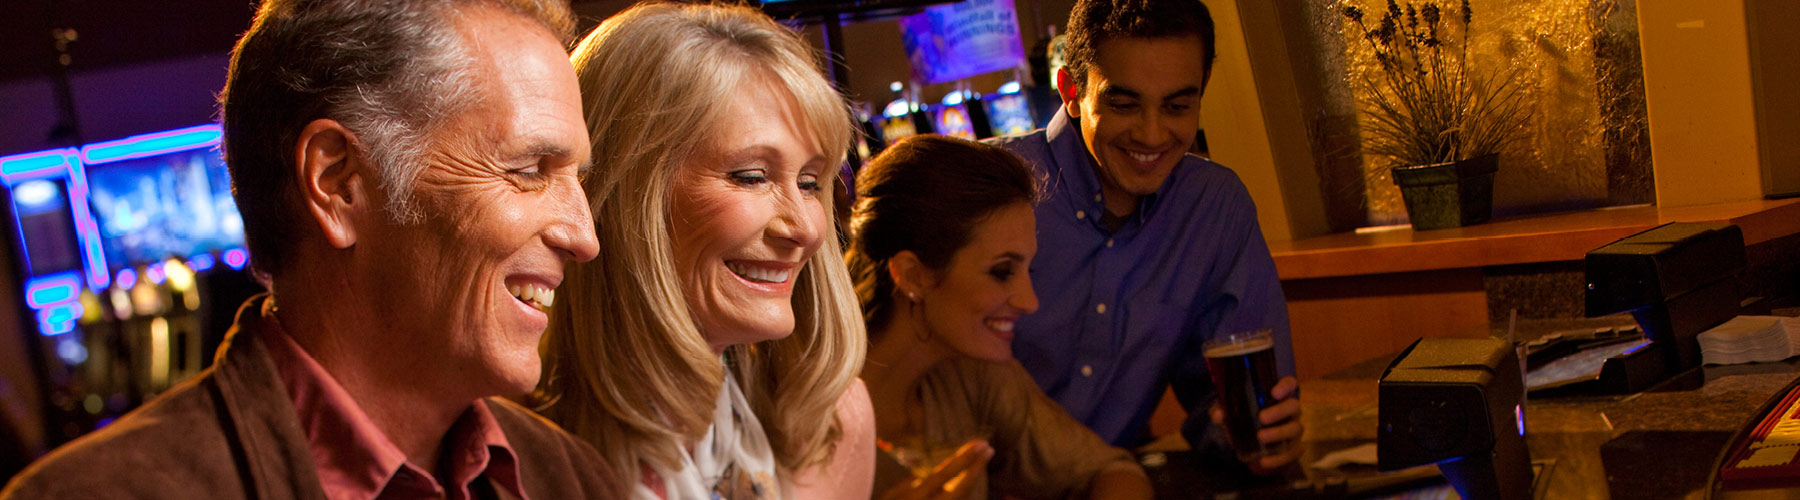 Ruidoso casino apache criticisms of the iowa gambling task